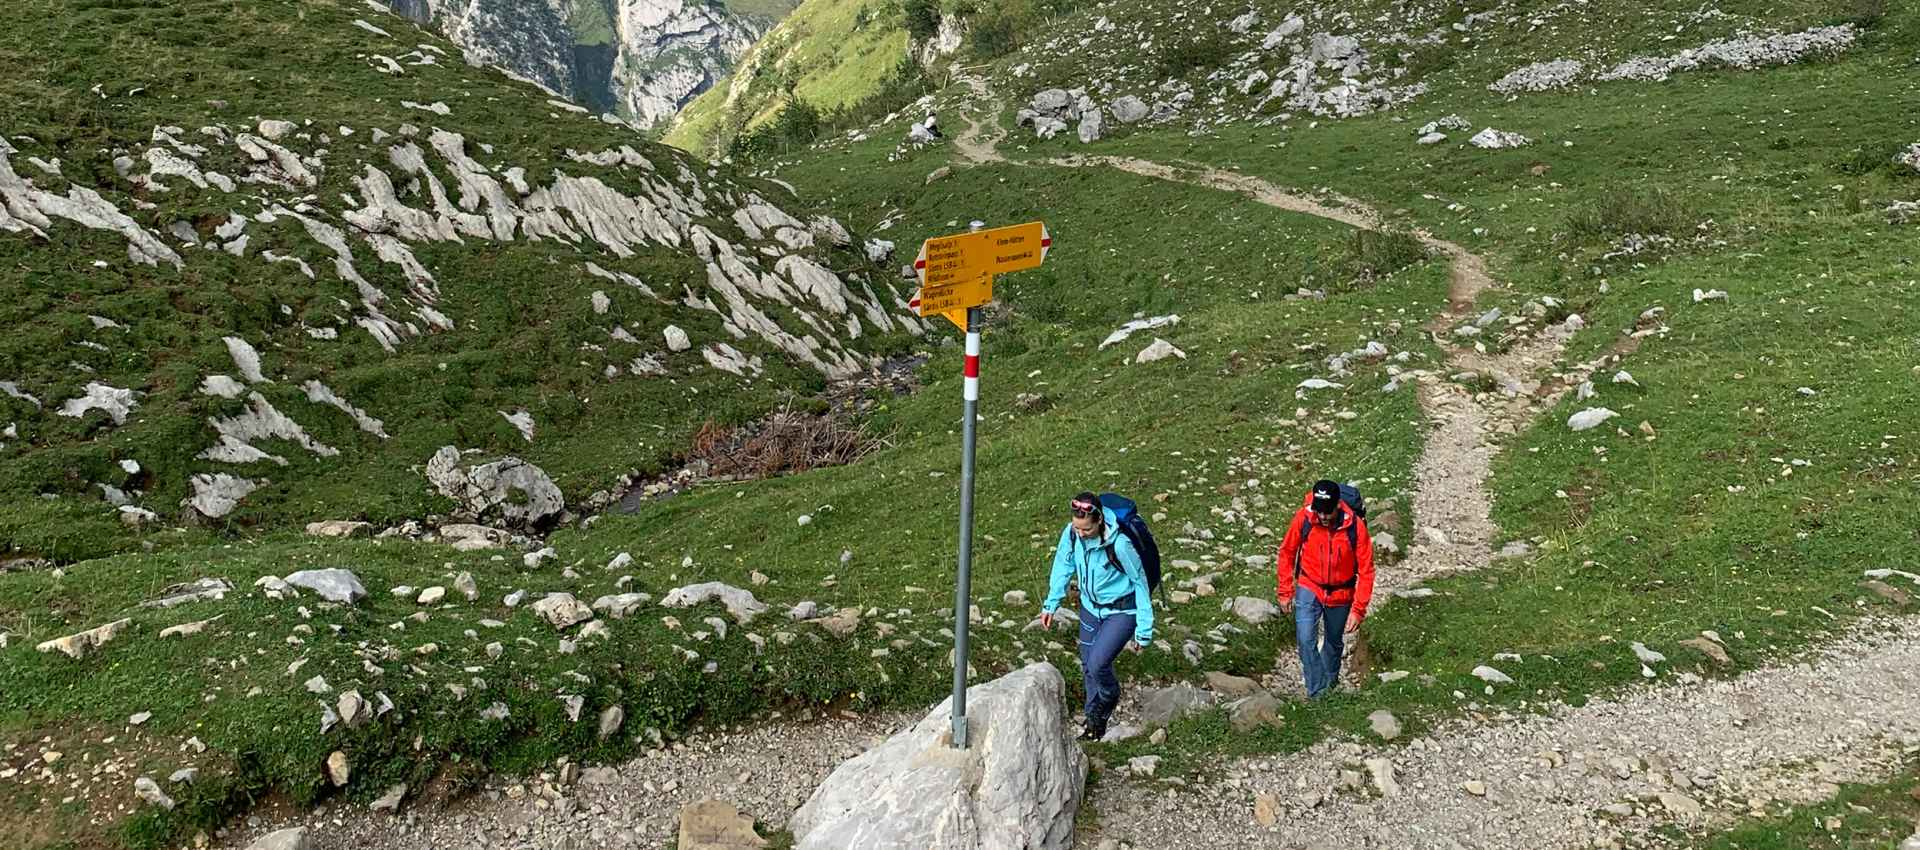 2021_lowa-schweiz_wanderprojekt_op_wanderprojekt_smp_alpstein